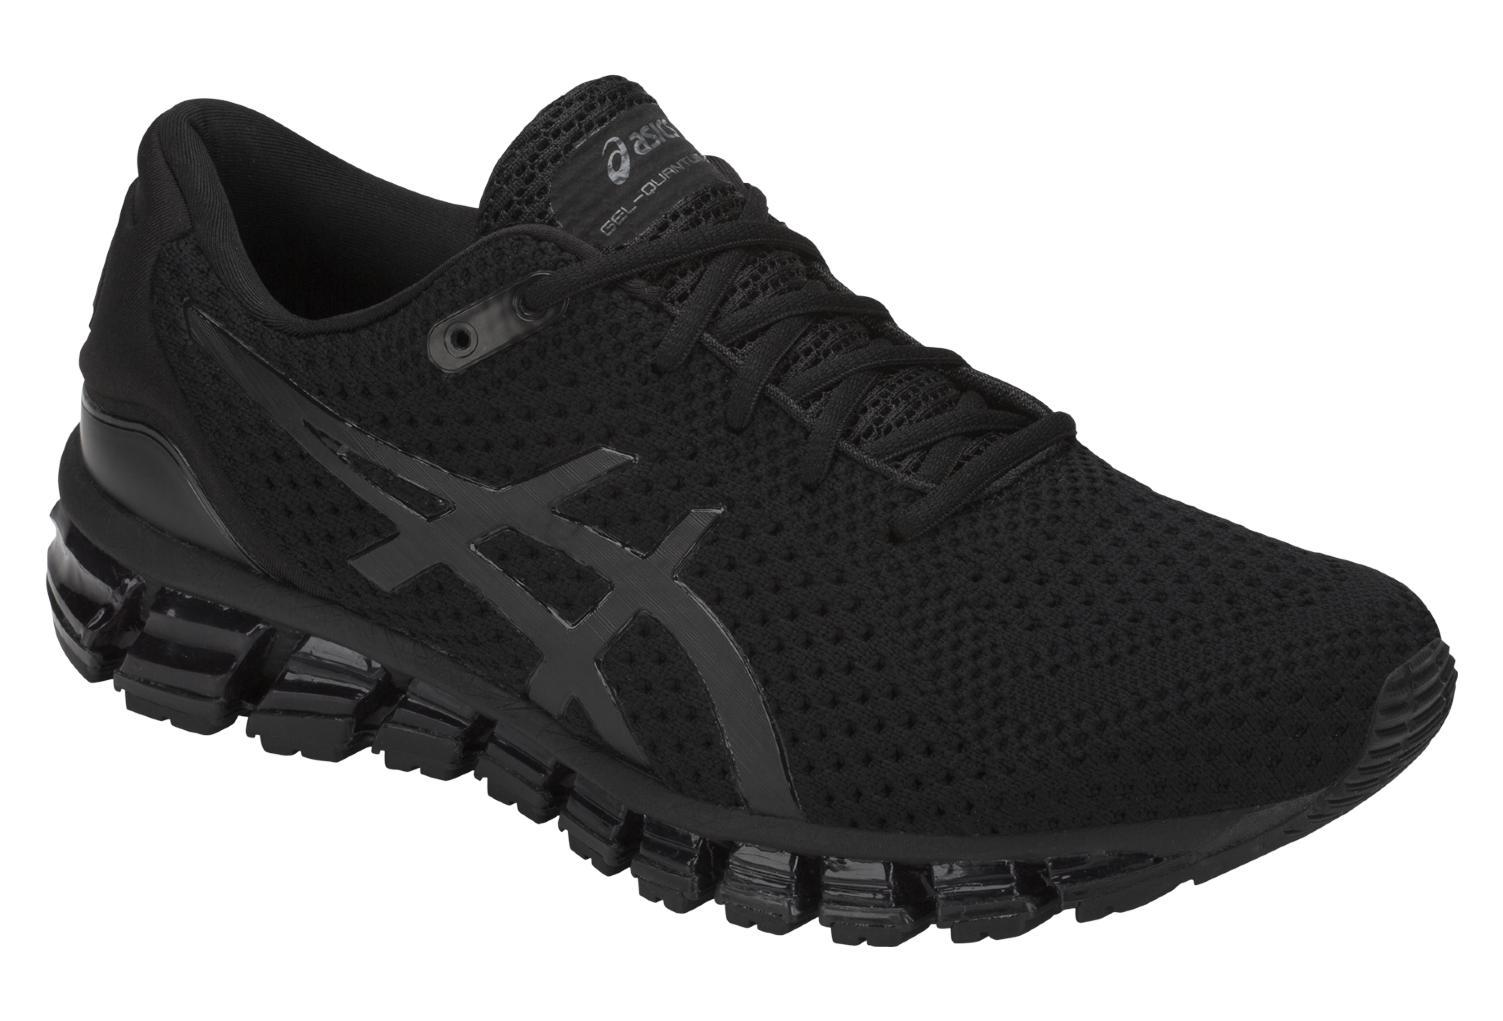 info for 076a4 be788 Asics Shoes Run Gel Quantum 360 Knit 2 Black Men